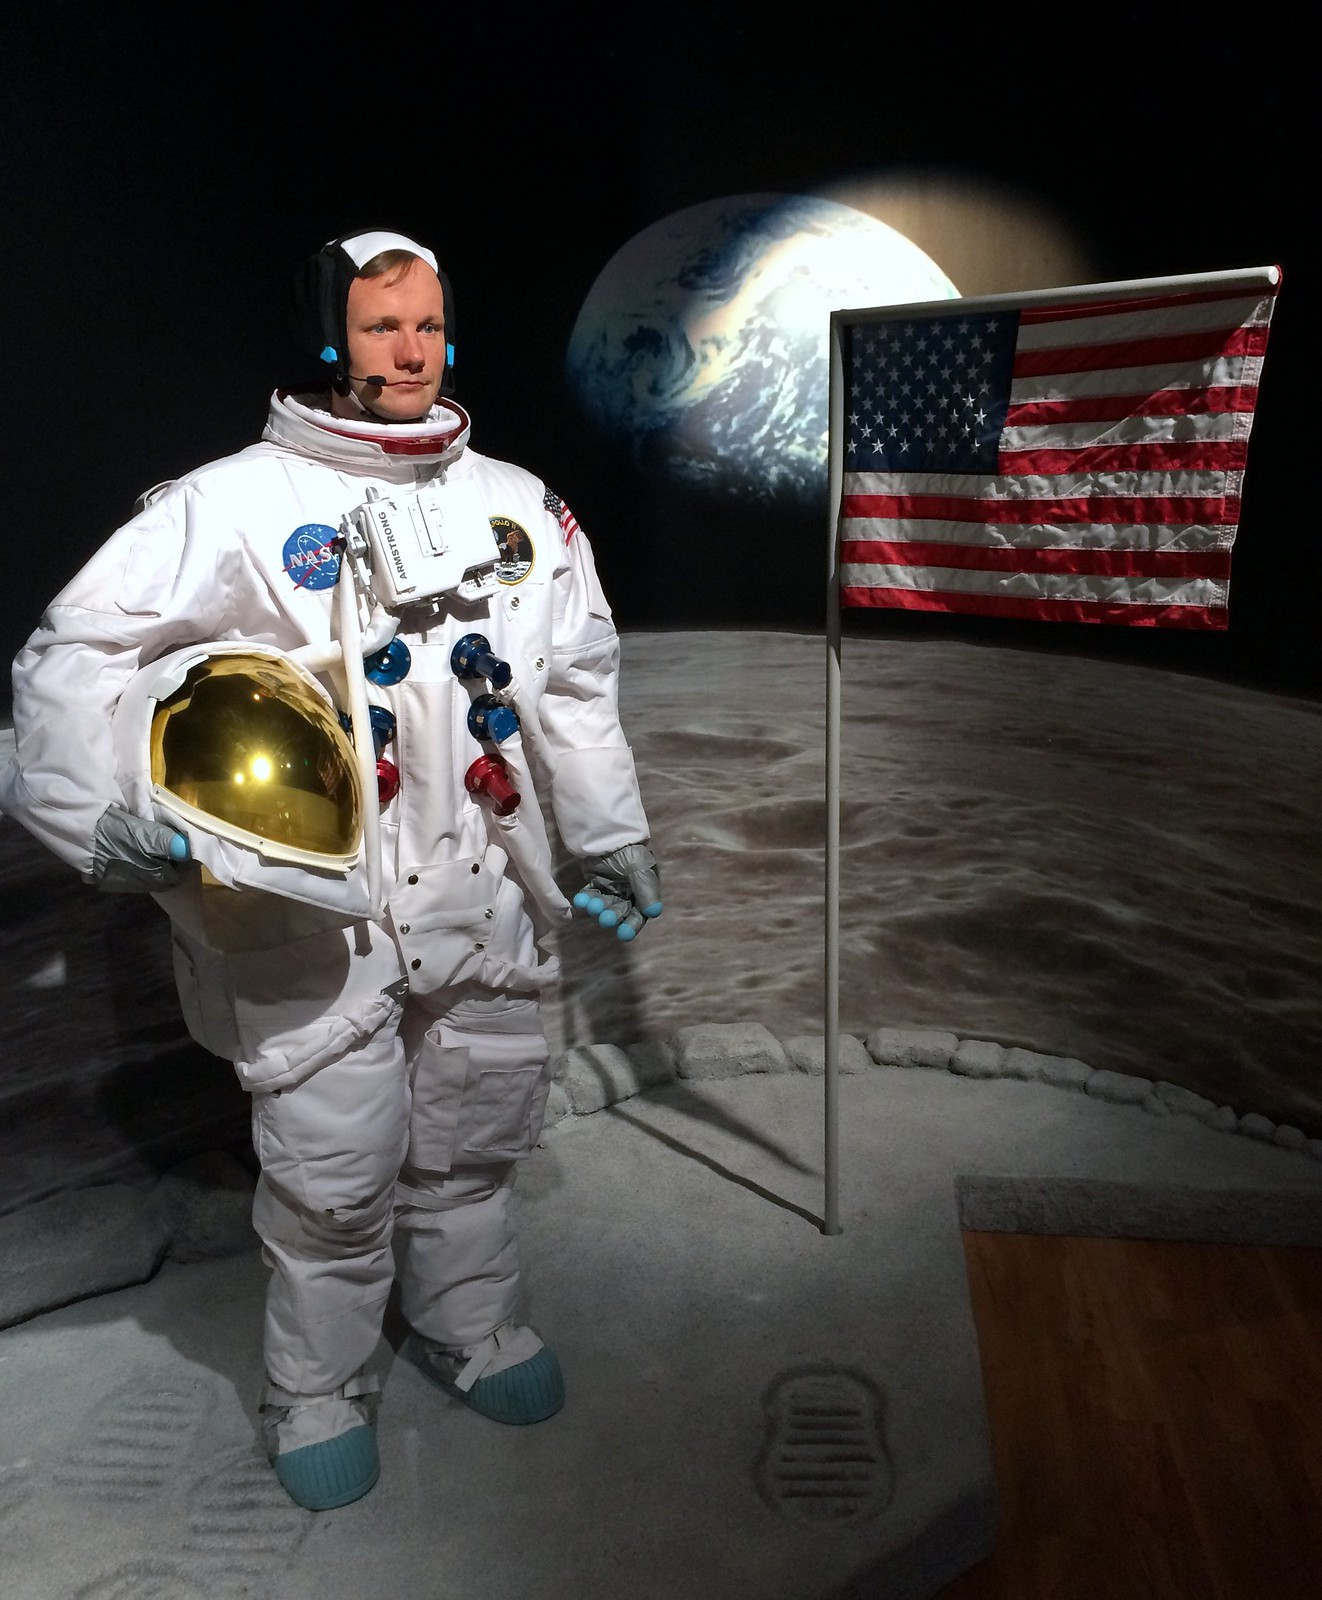 Orlando - Madame Tussauds Orlando - Neil Armstrong